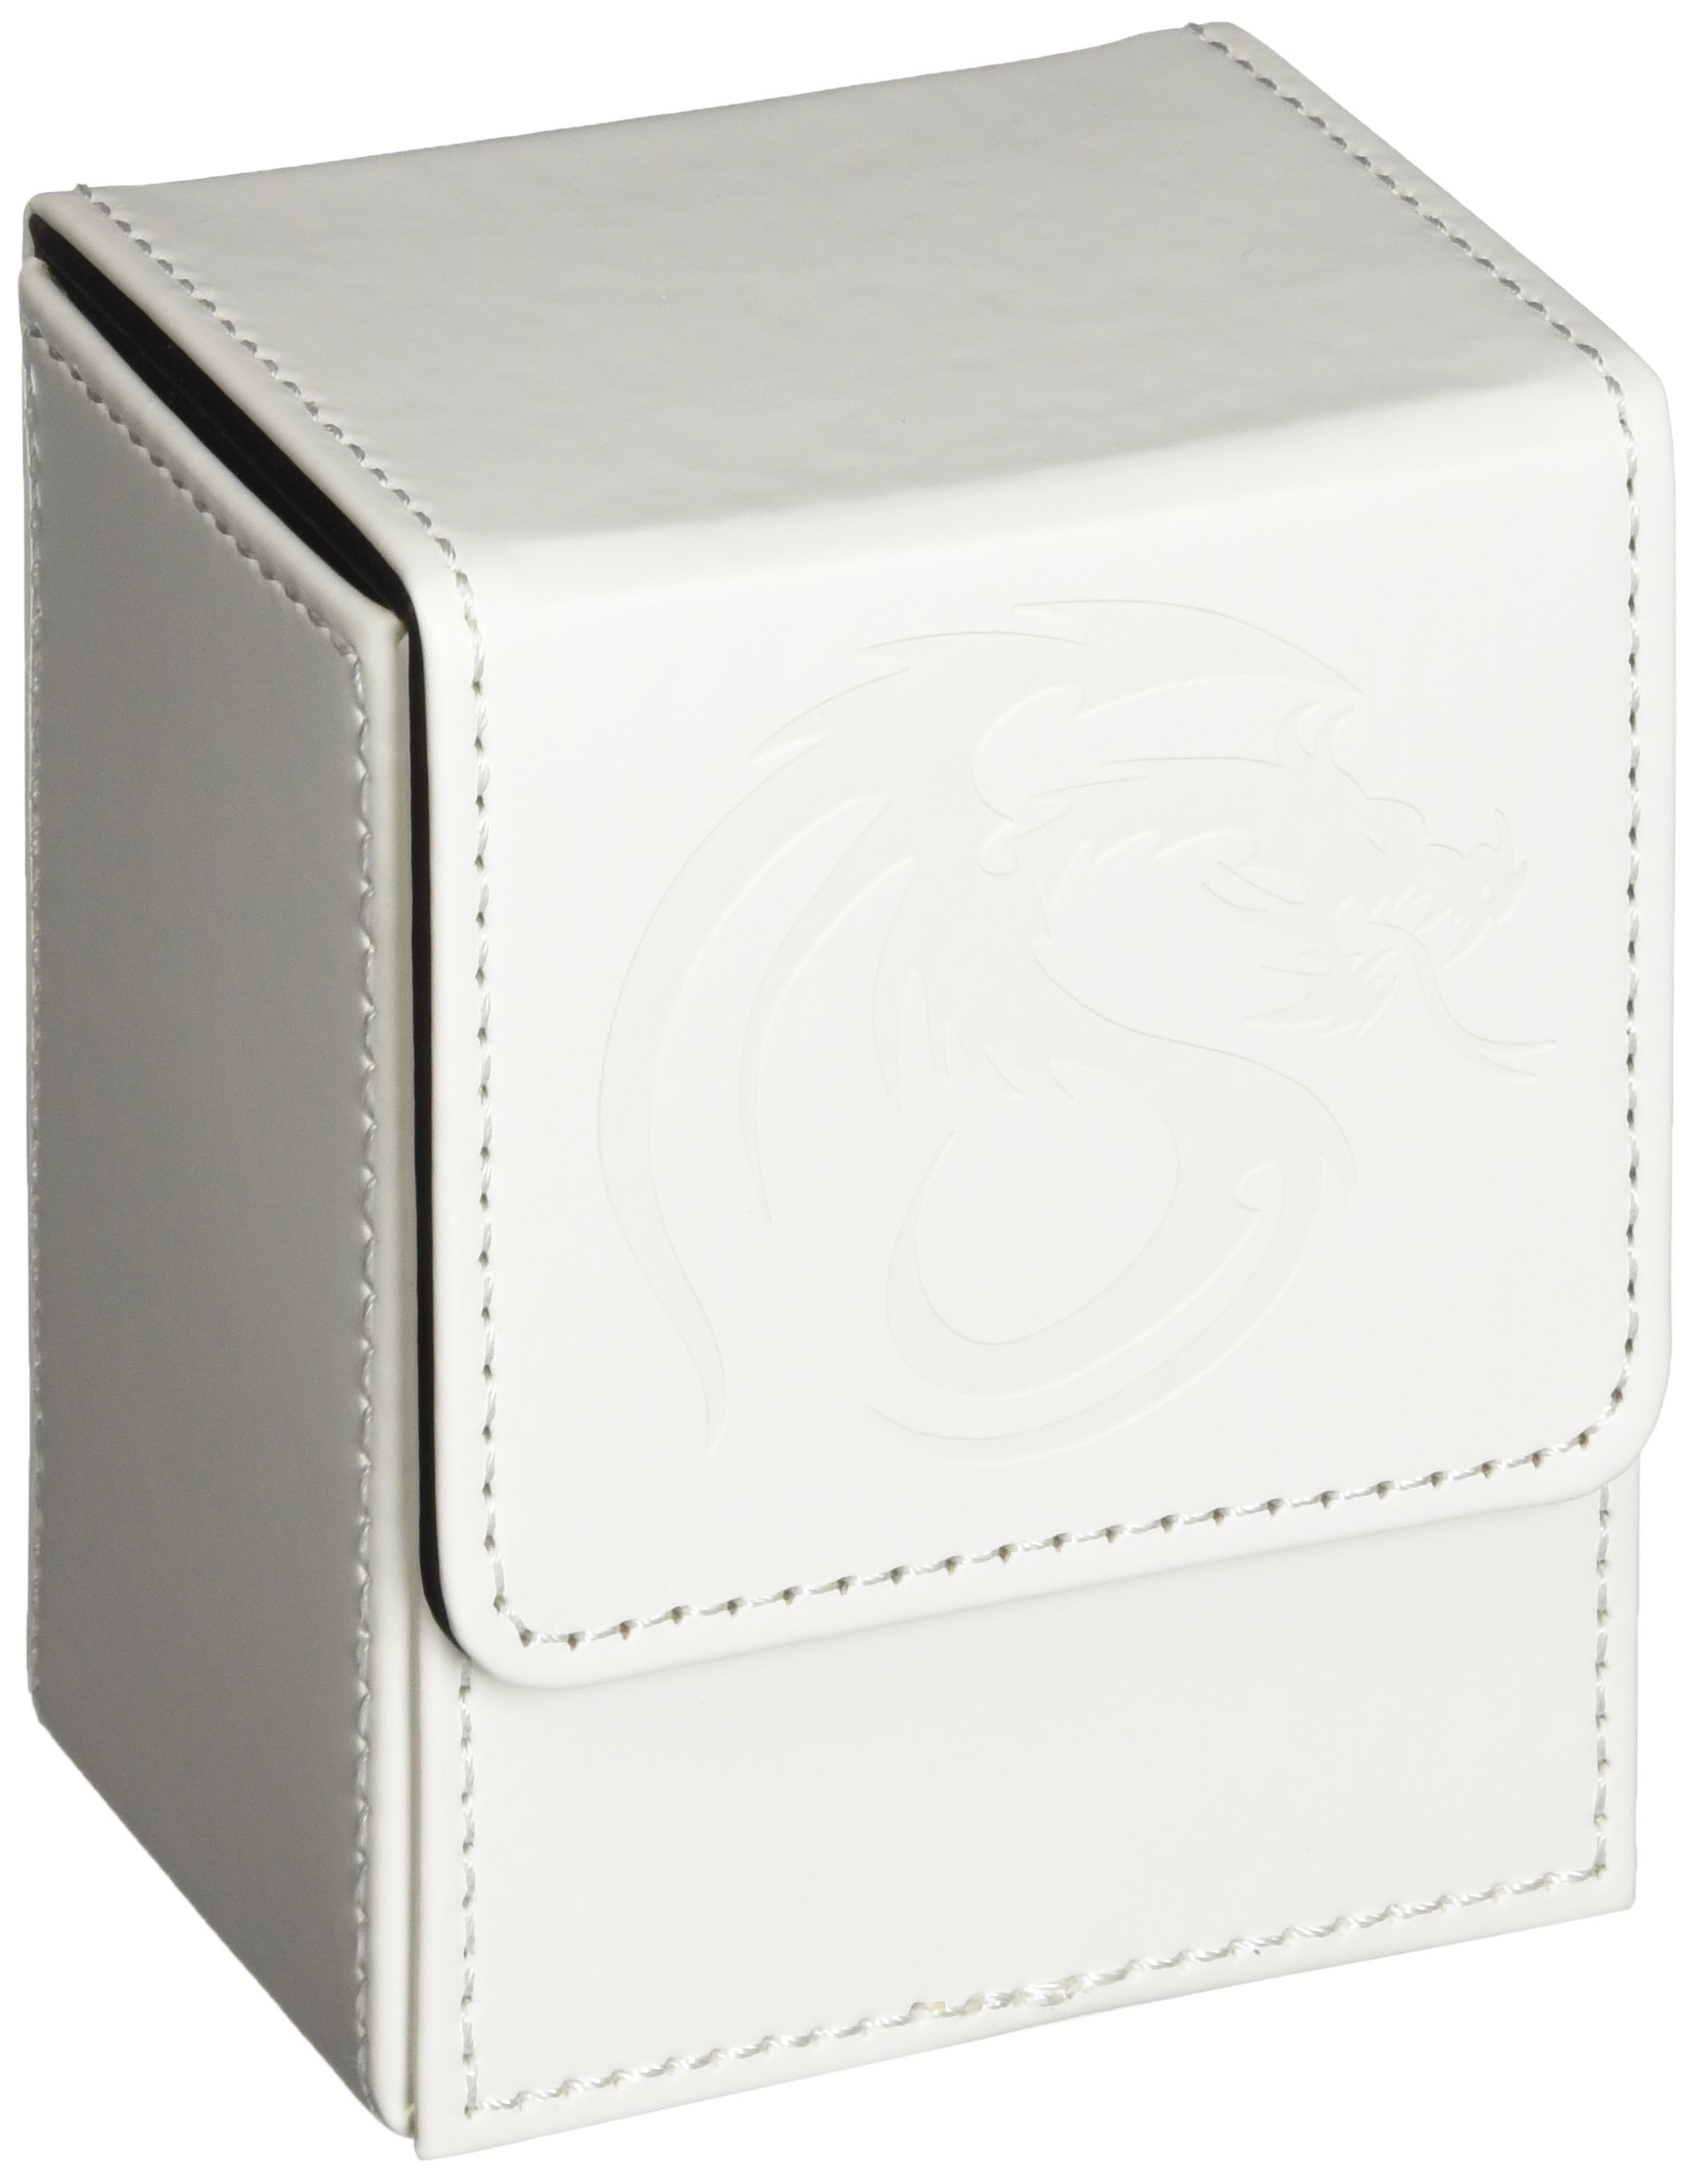 LX Deck Case, White